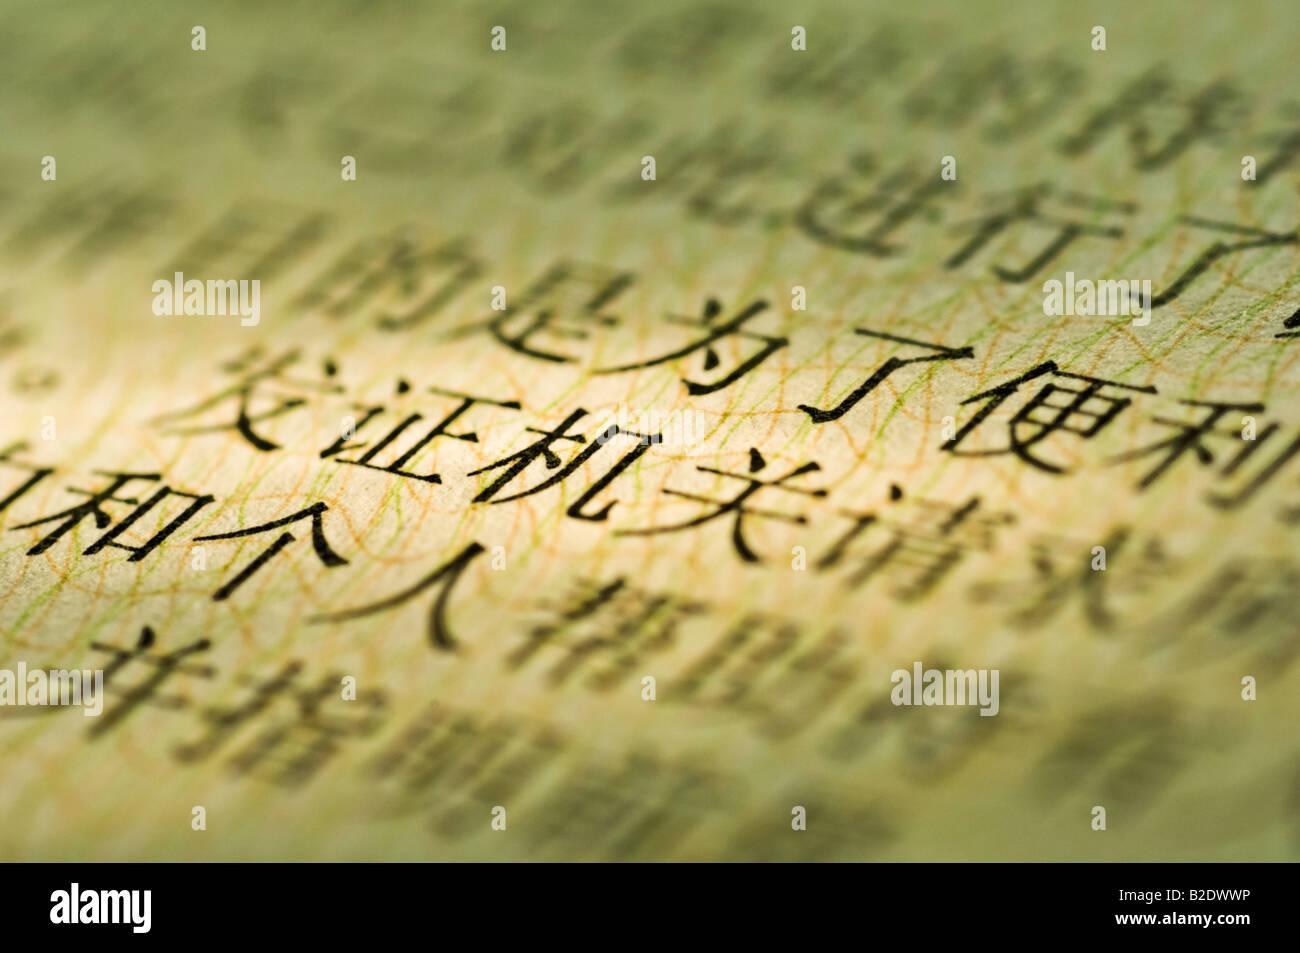 Tipografia cinese in una carta di stampa Immagini Stock